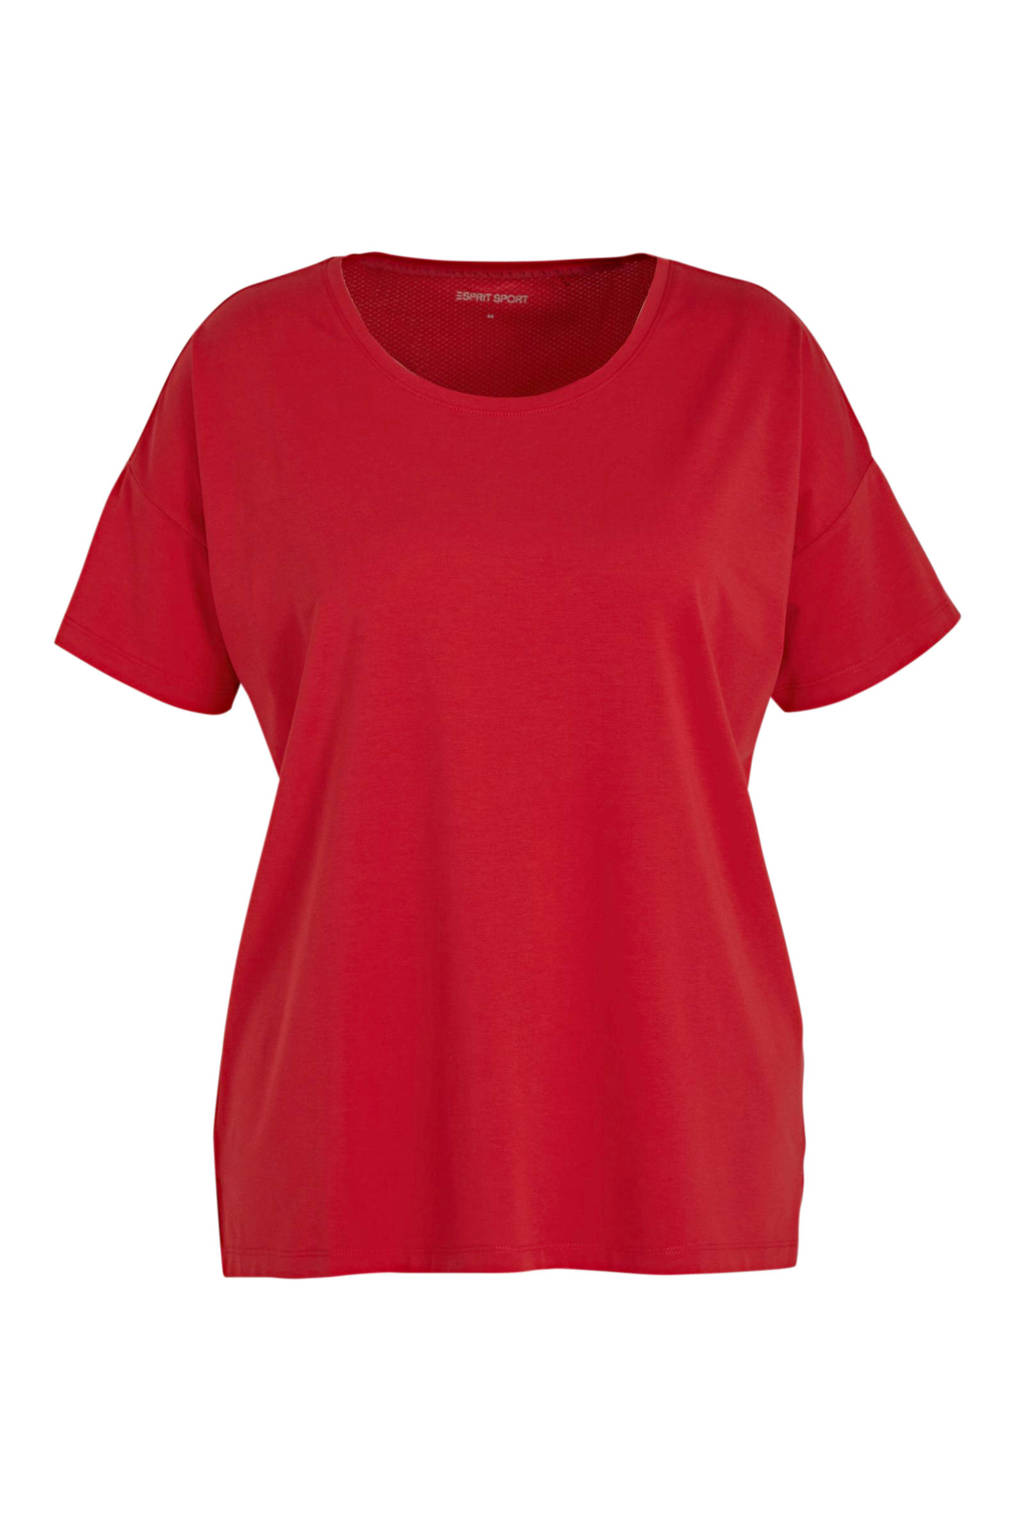 ESPRIT Women Sports sport T-shirt rood, Rood